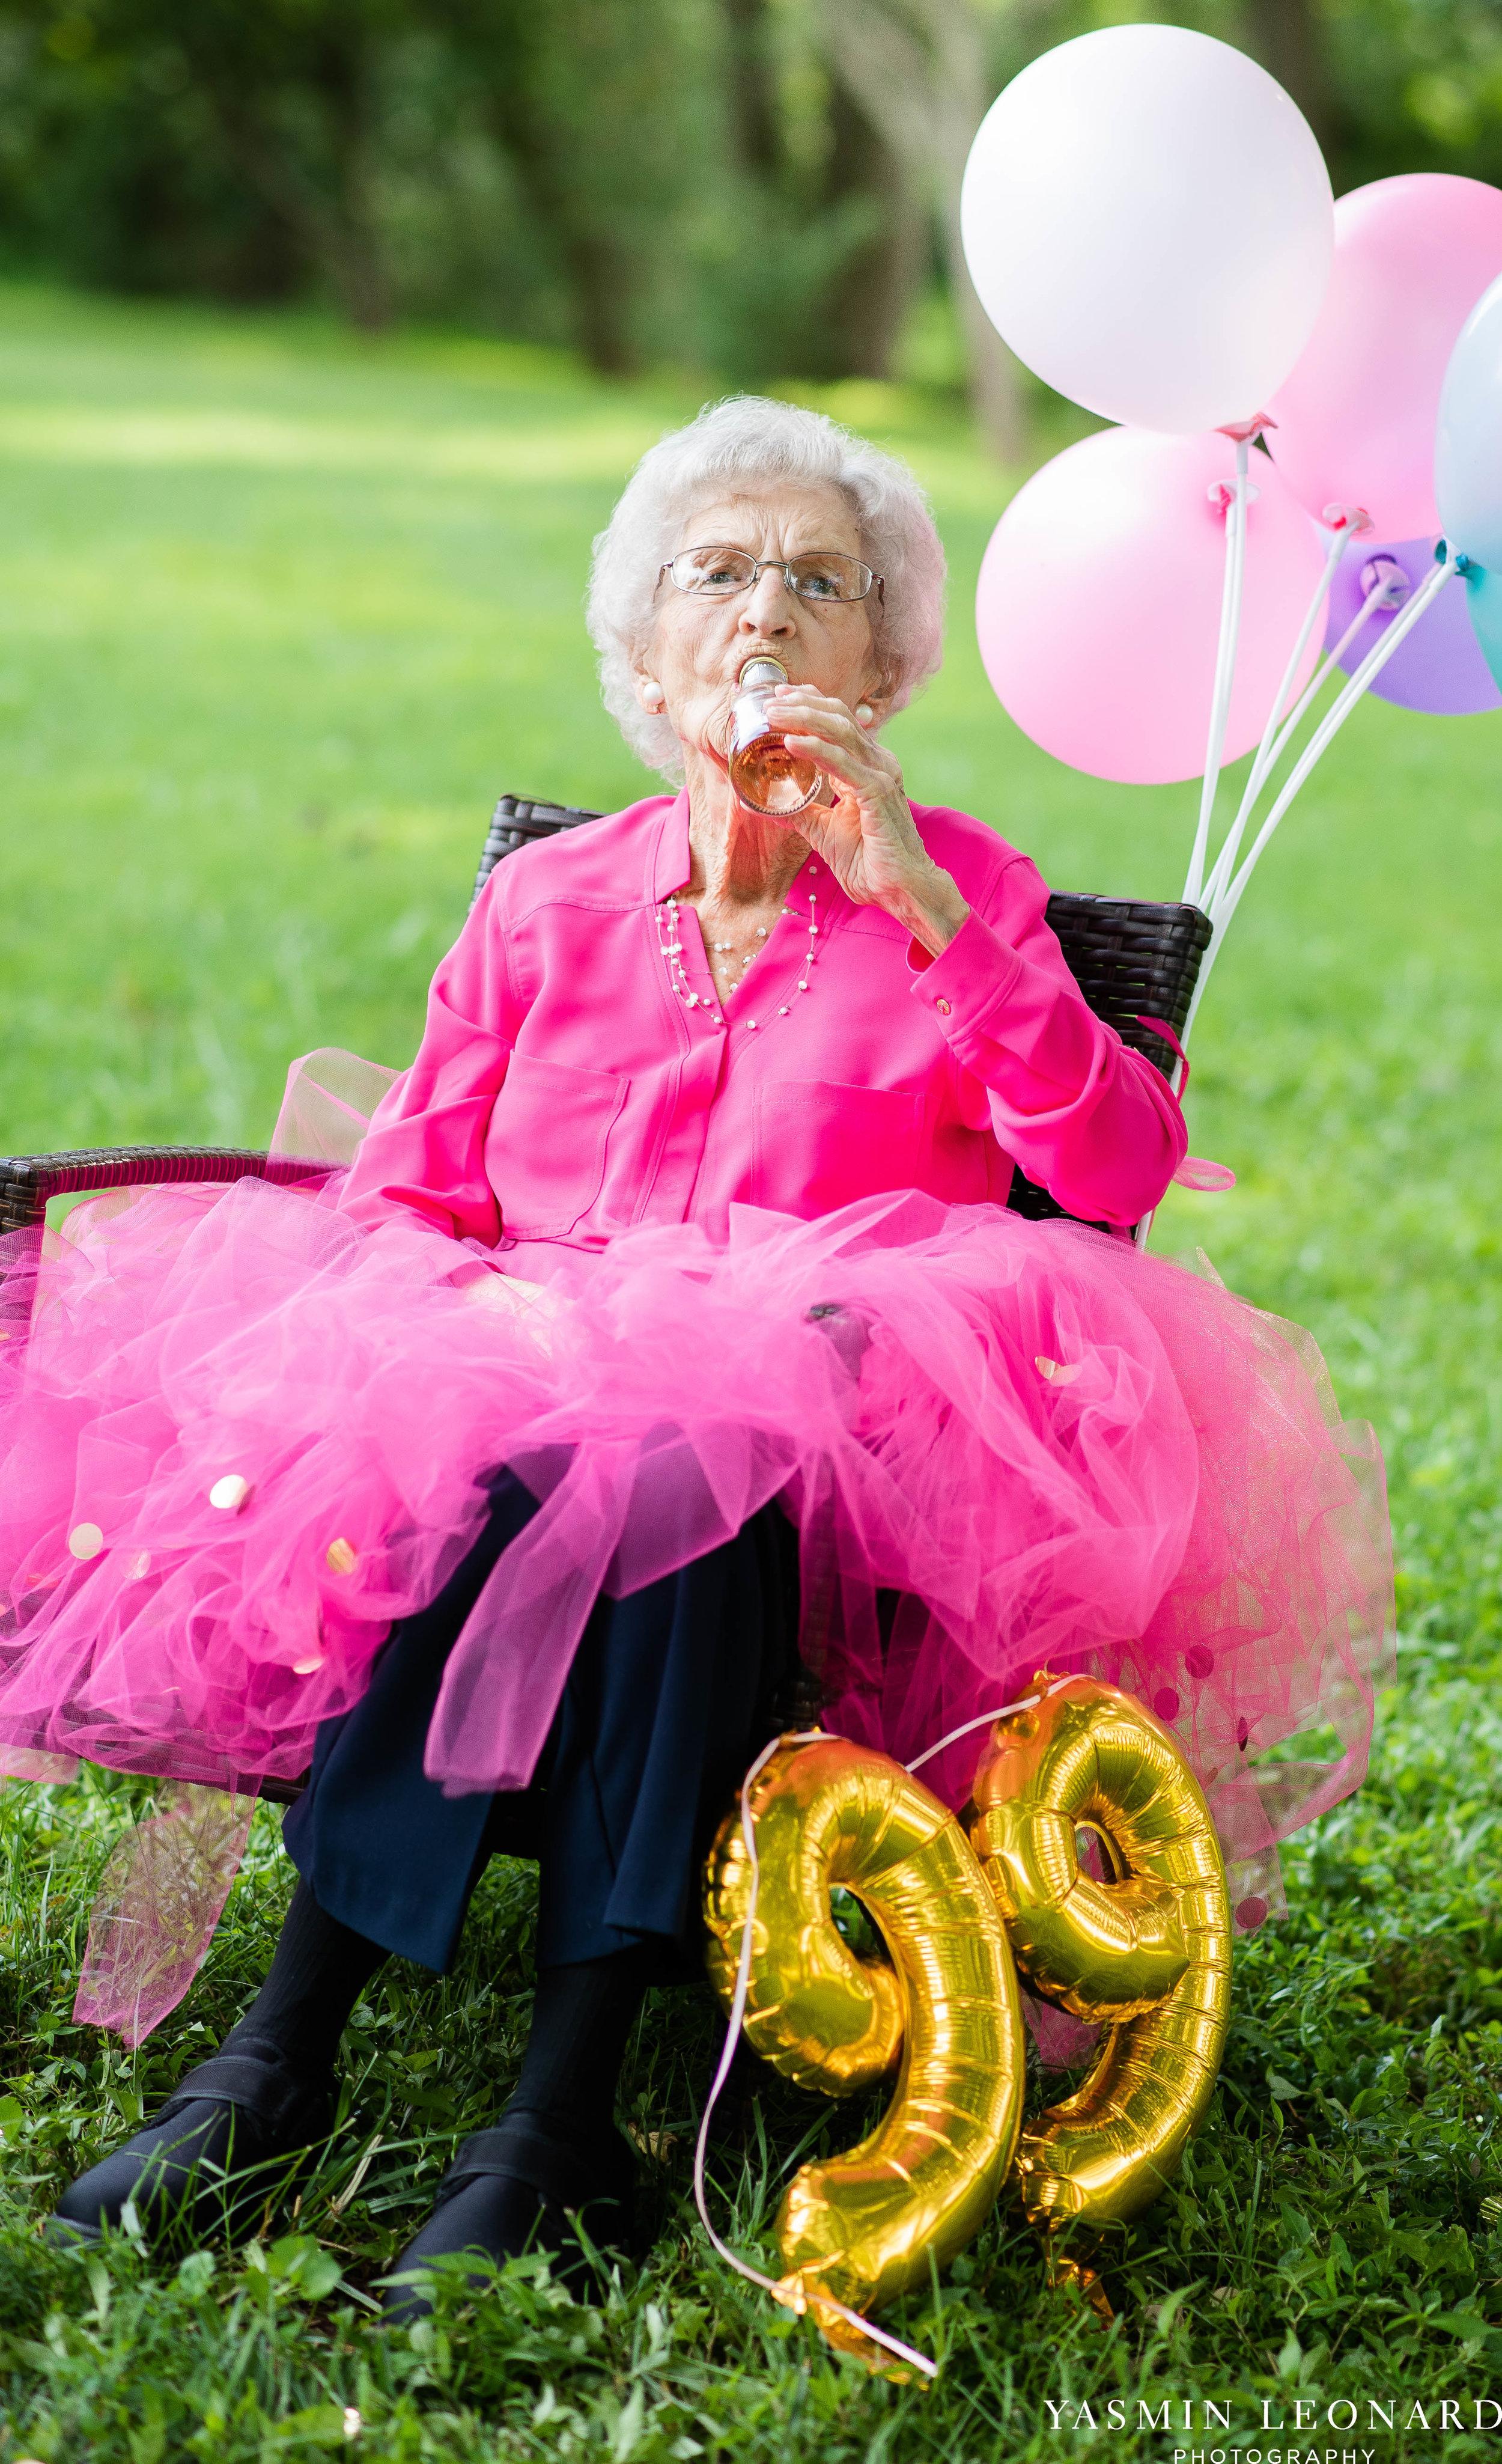 99 Year Old Birthday - Great Grandma Birthday Session - Grandma Birthday Session - 99 years Old - Adult Birthday Session - Four Generations-8.jpg